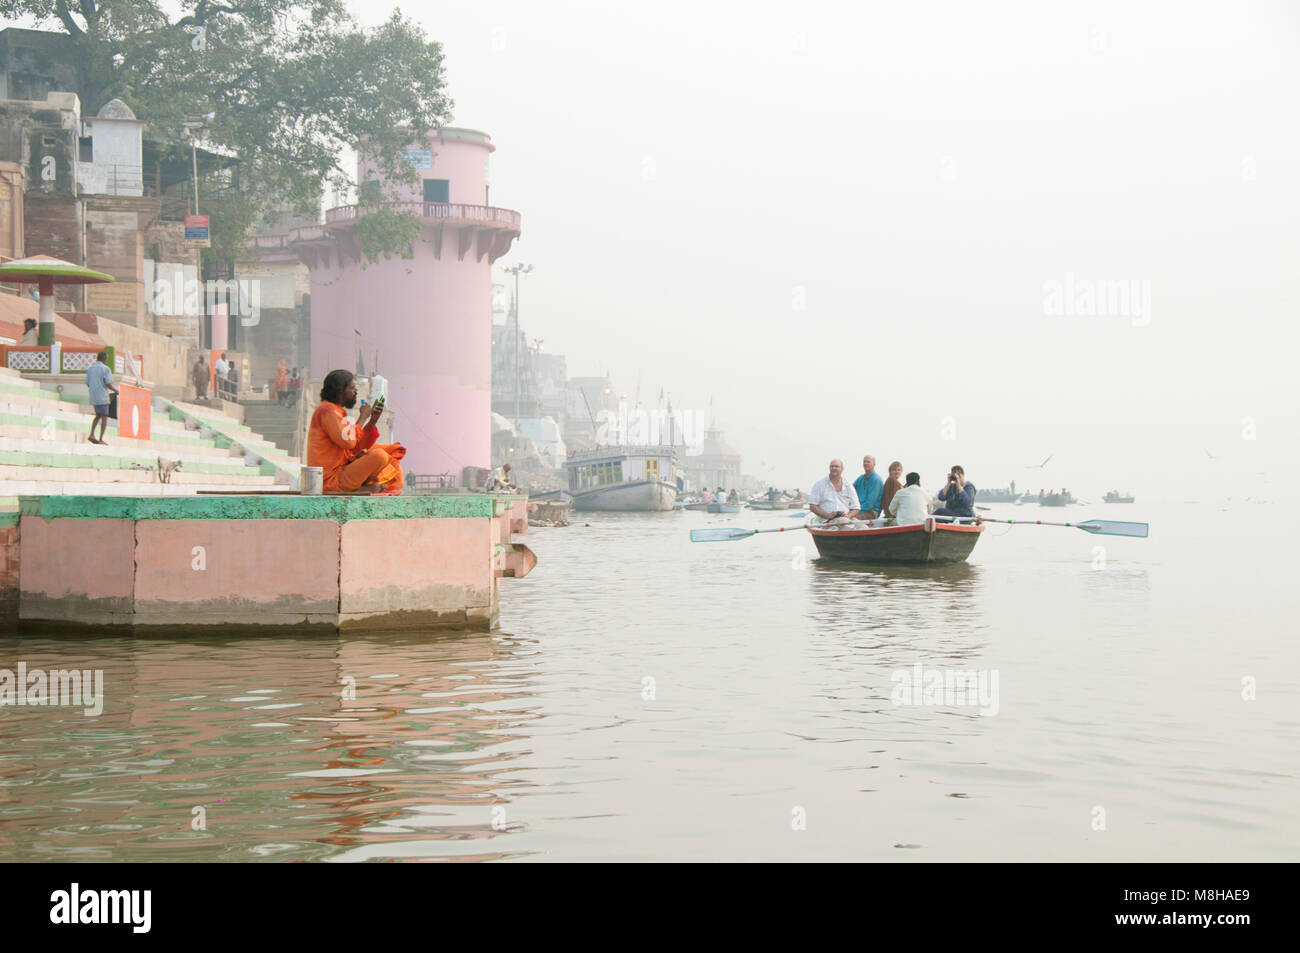 A sadhu of Varanasi, India - Stock Image